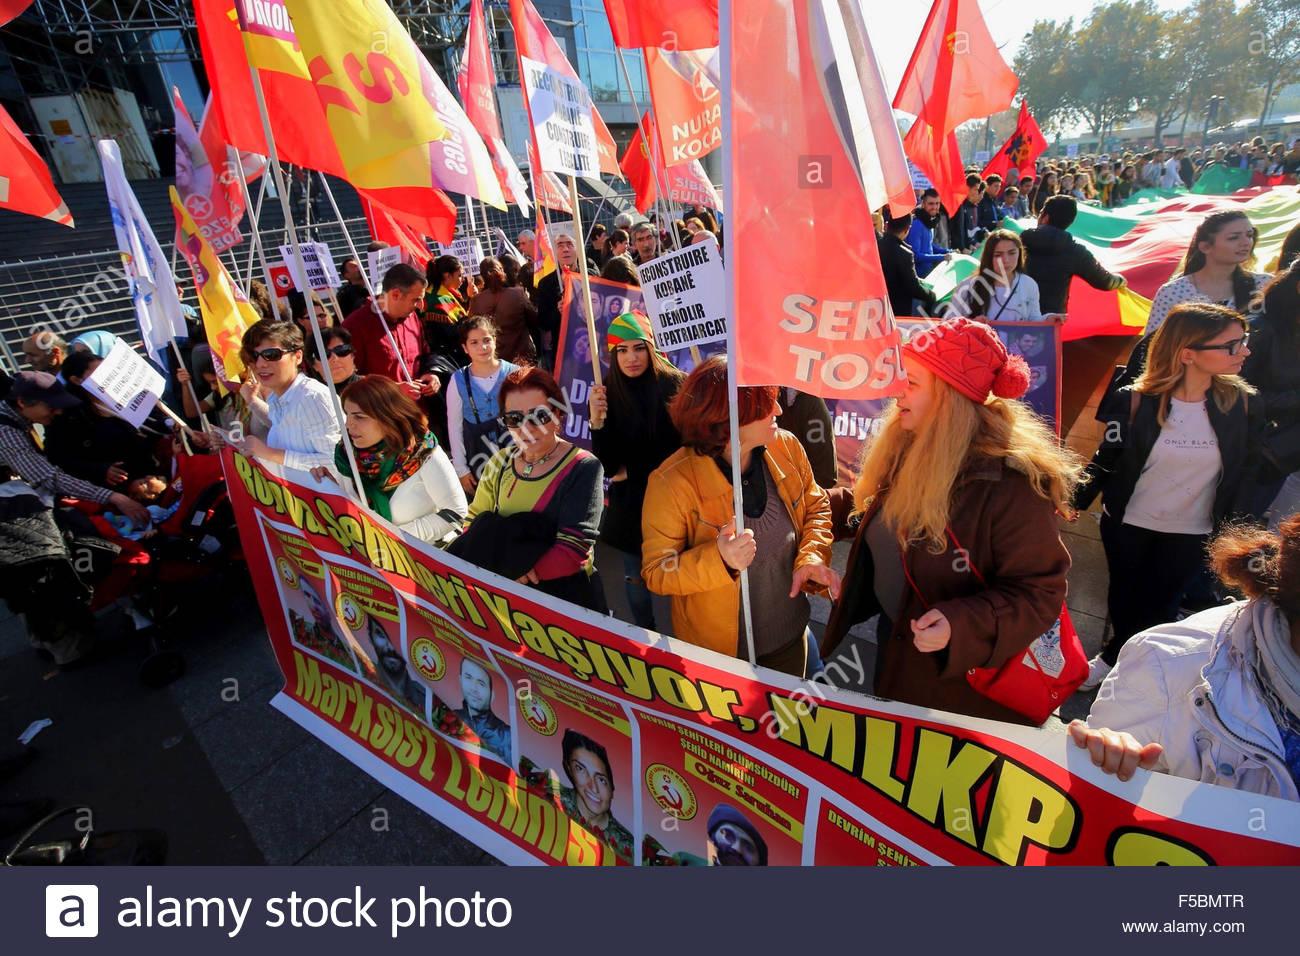 Paris, France. novembre 1st, 2015. FRANCE, Paris: People attend a pro kurdish demonstration in support of Kobane, Stock Photo